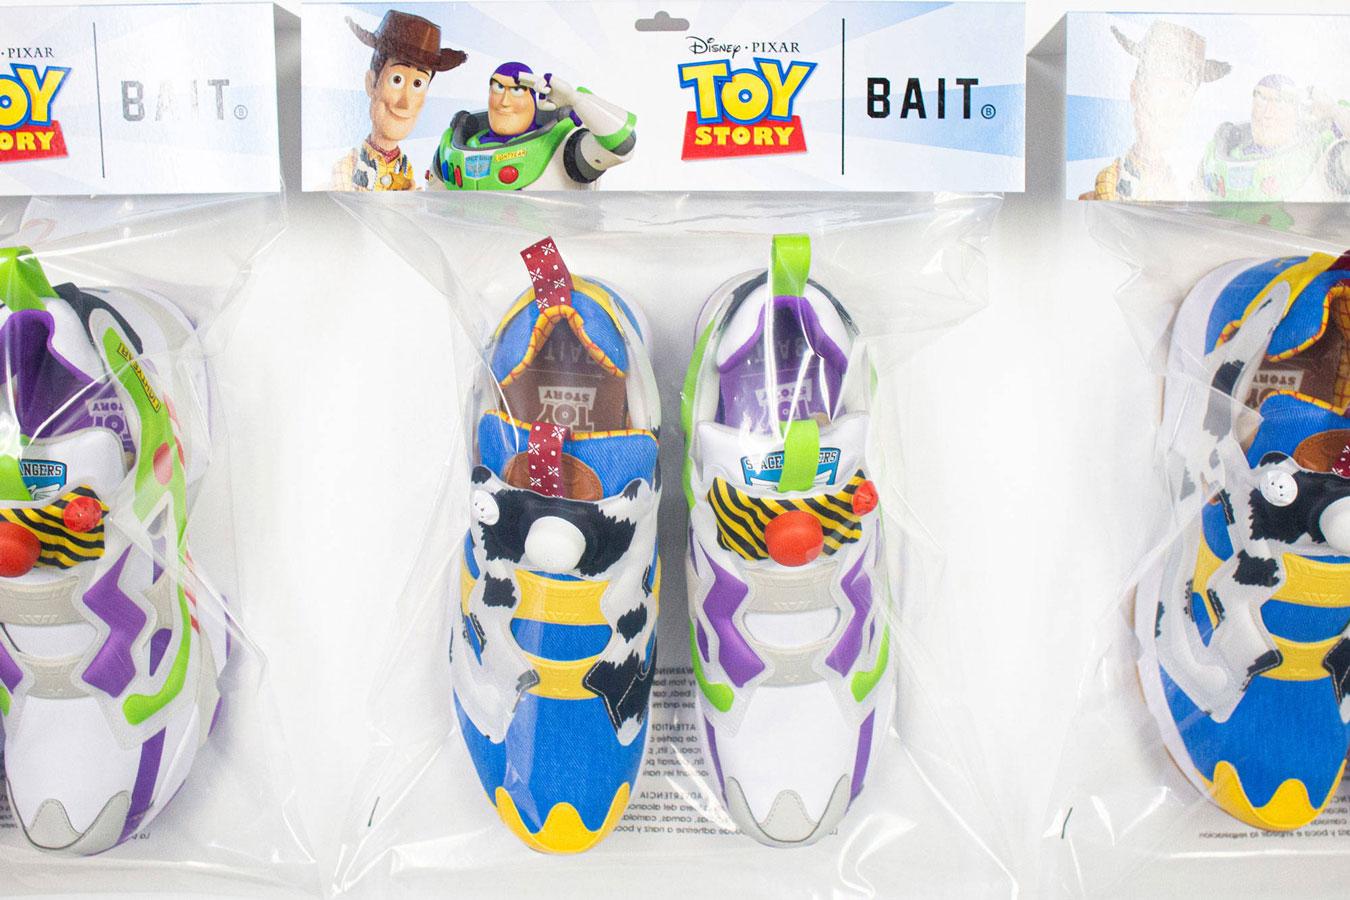 Zapatillas Reebok Toy Story